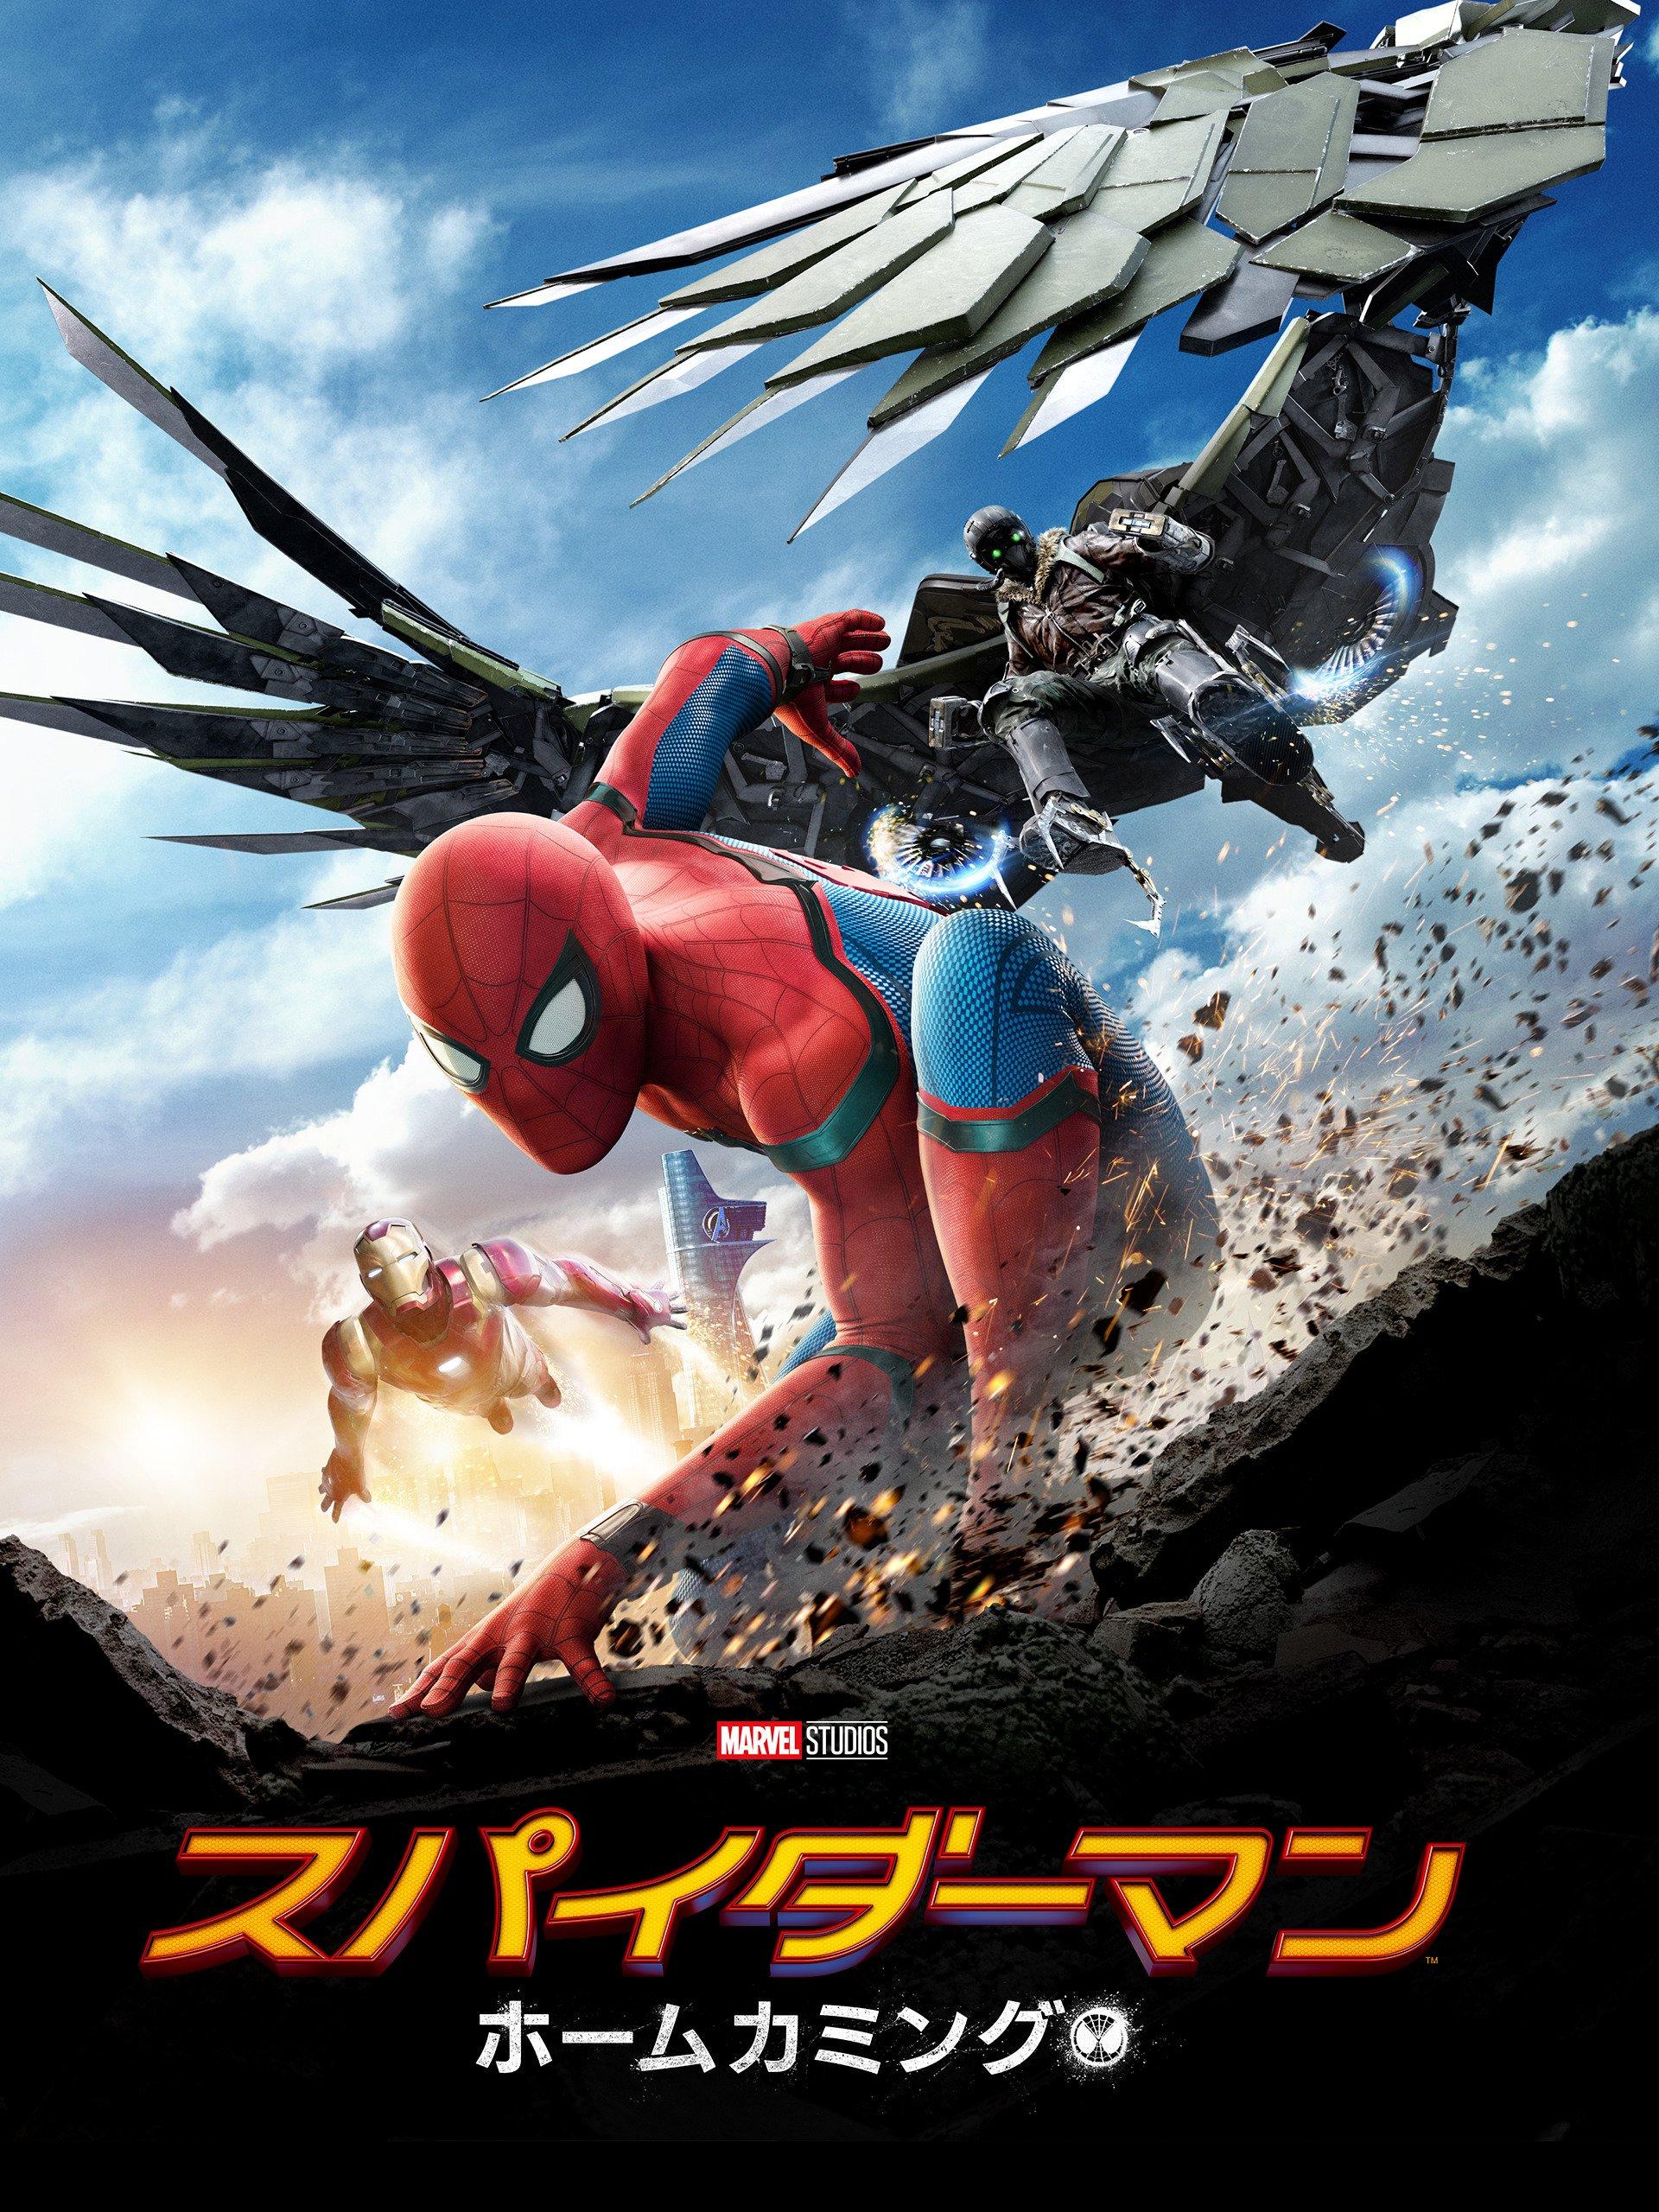 Amazon Co Jp スパイダーマン ホームカミング 字幕版 を観る